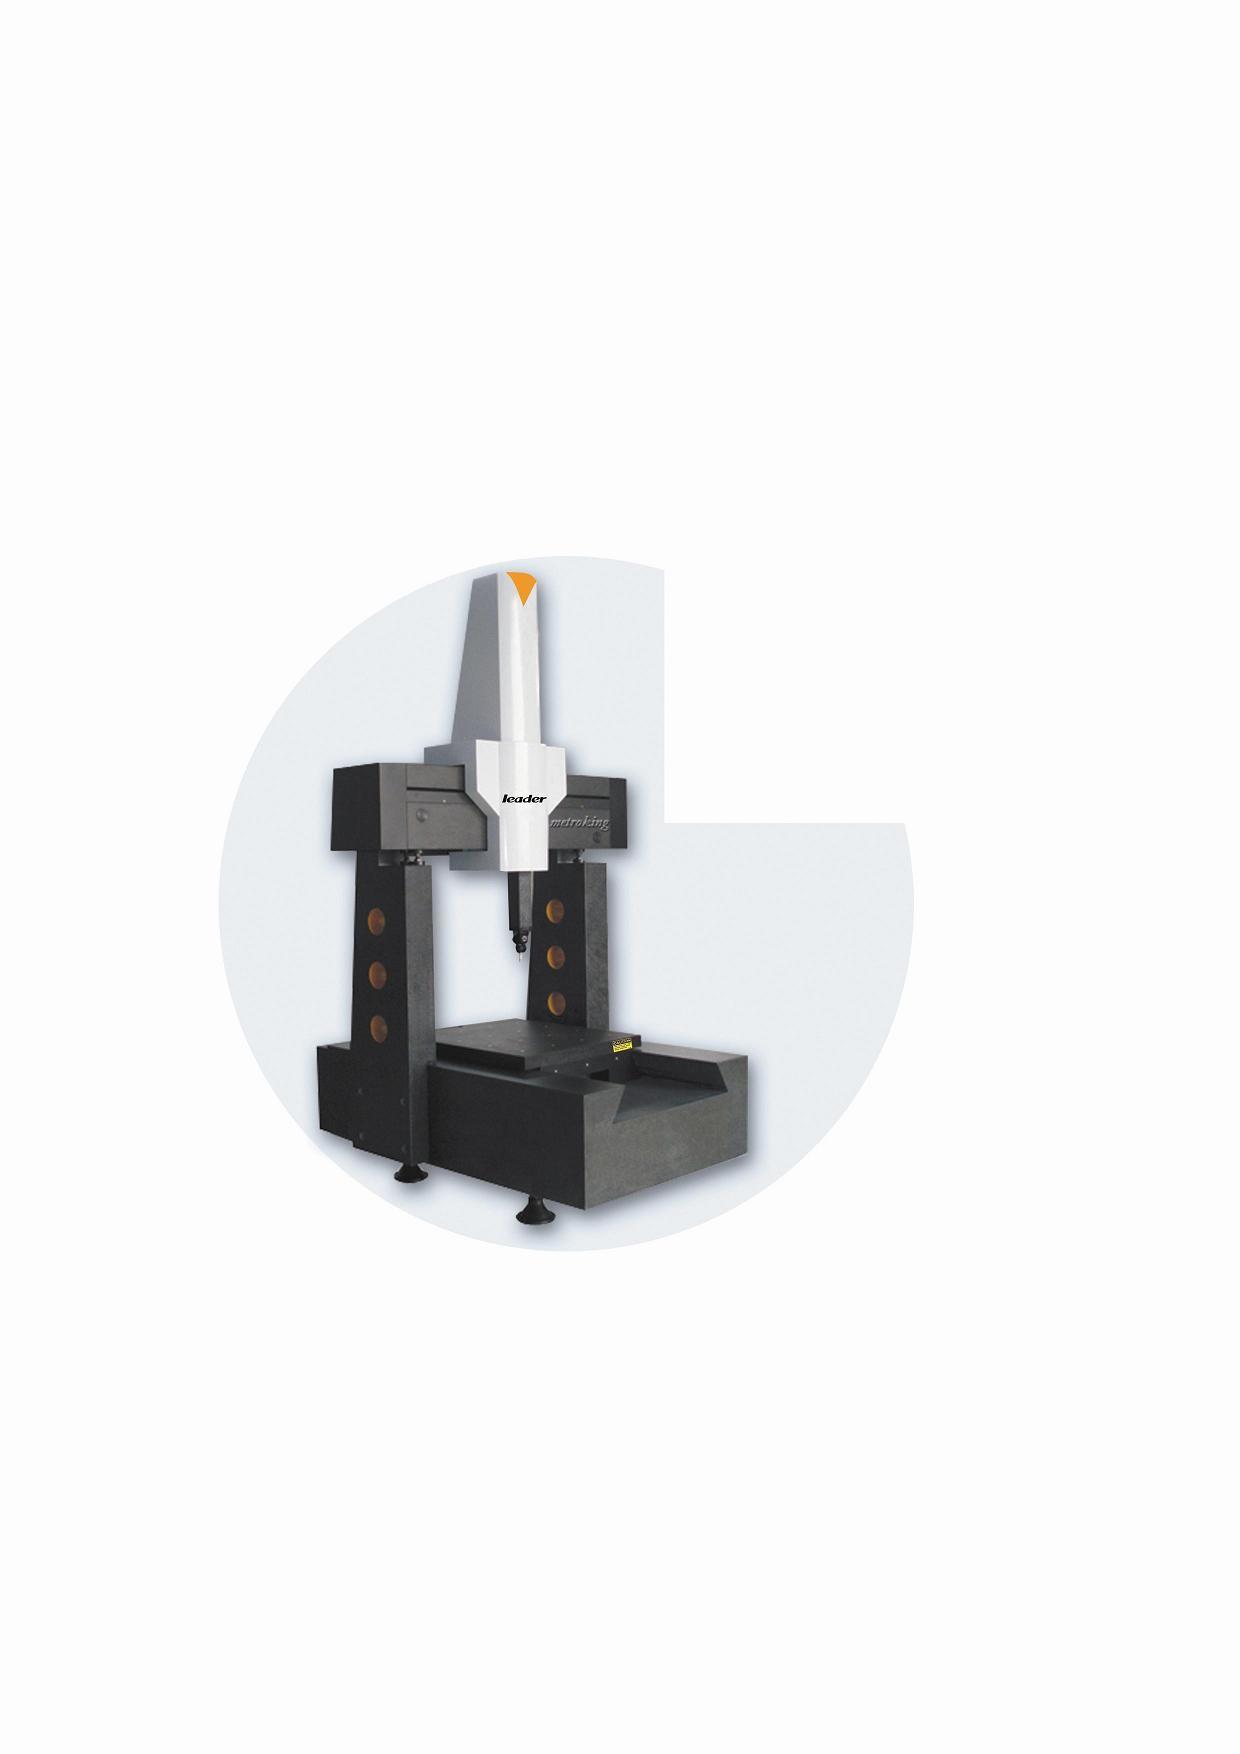 Coordinate Measuring Machine : China d coordinate measuring machine metroking